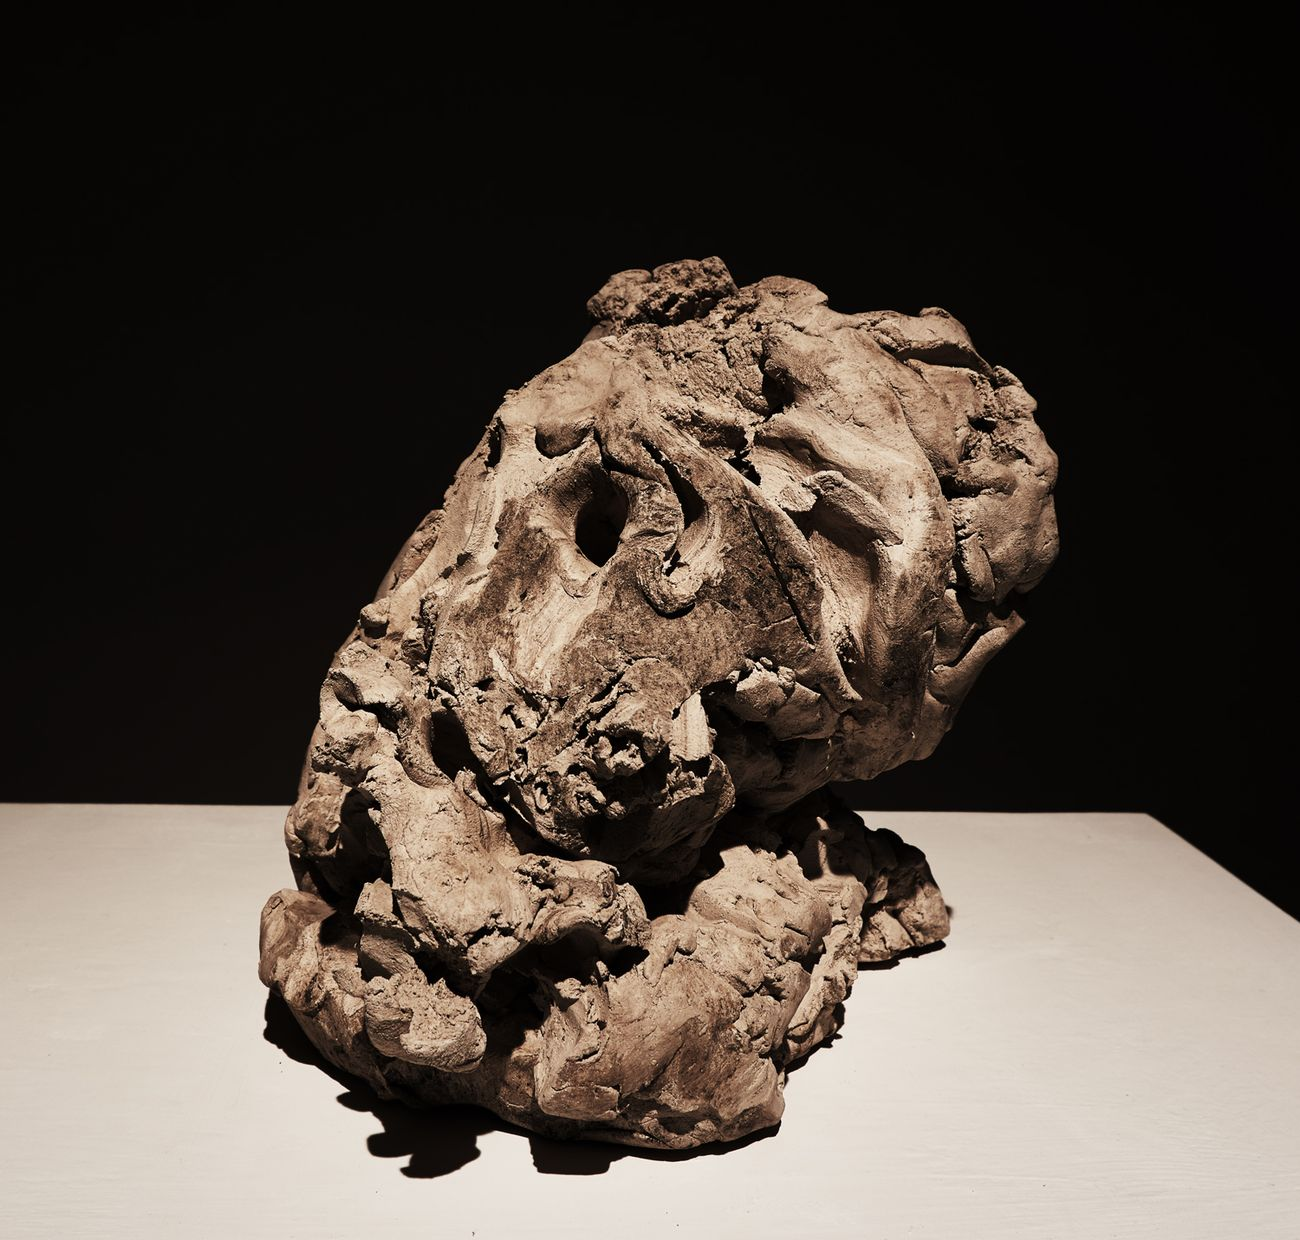 Emanuele Becheri, Testa, 2017, terracotta. Courtesy Galleria Nazionale, Roma